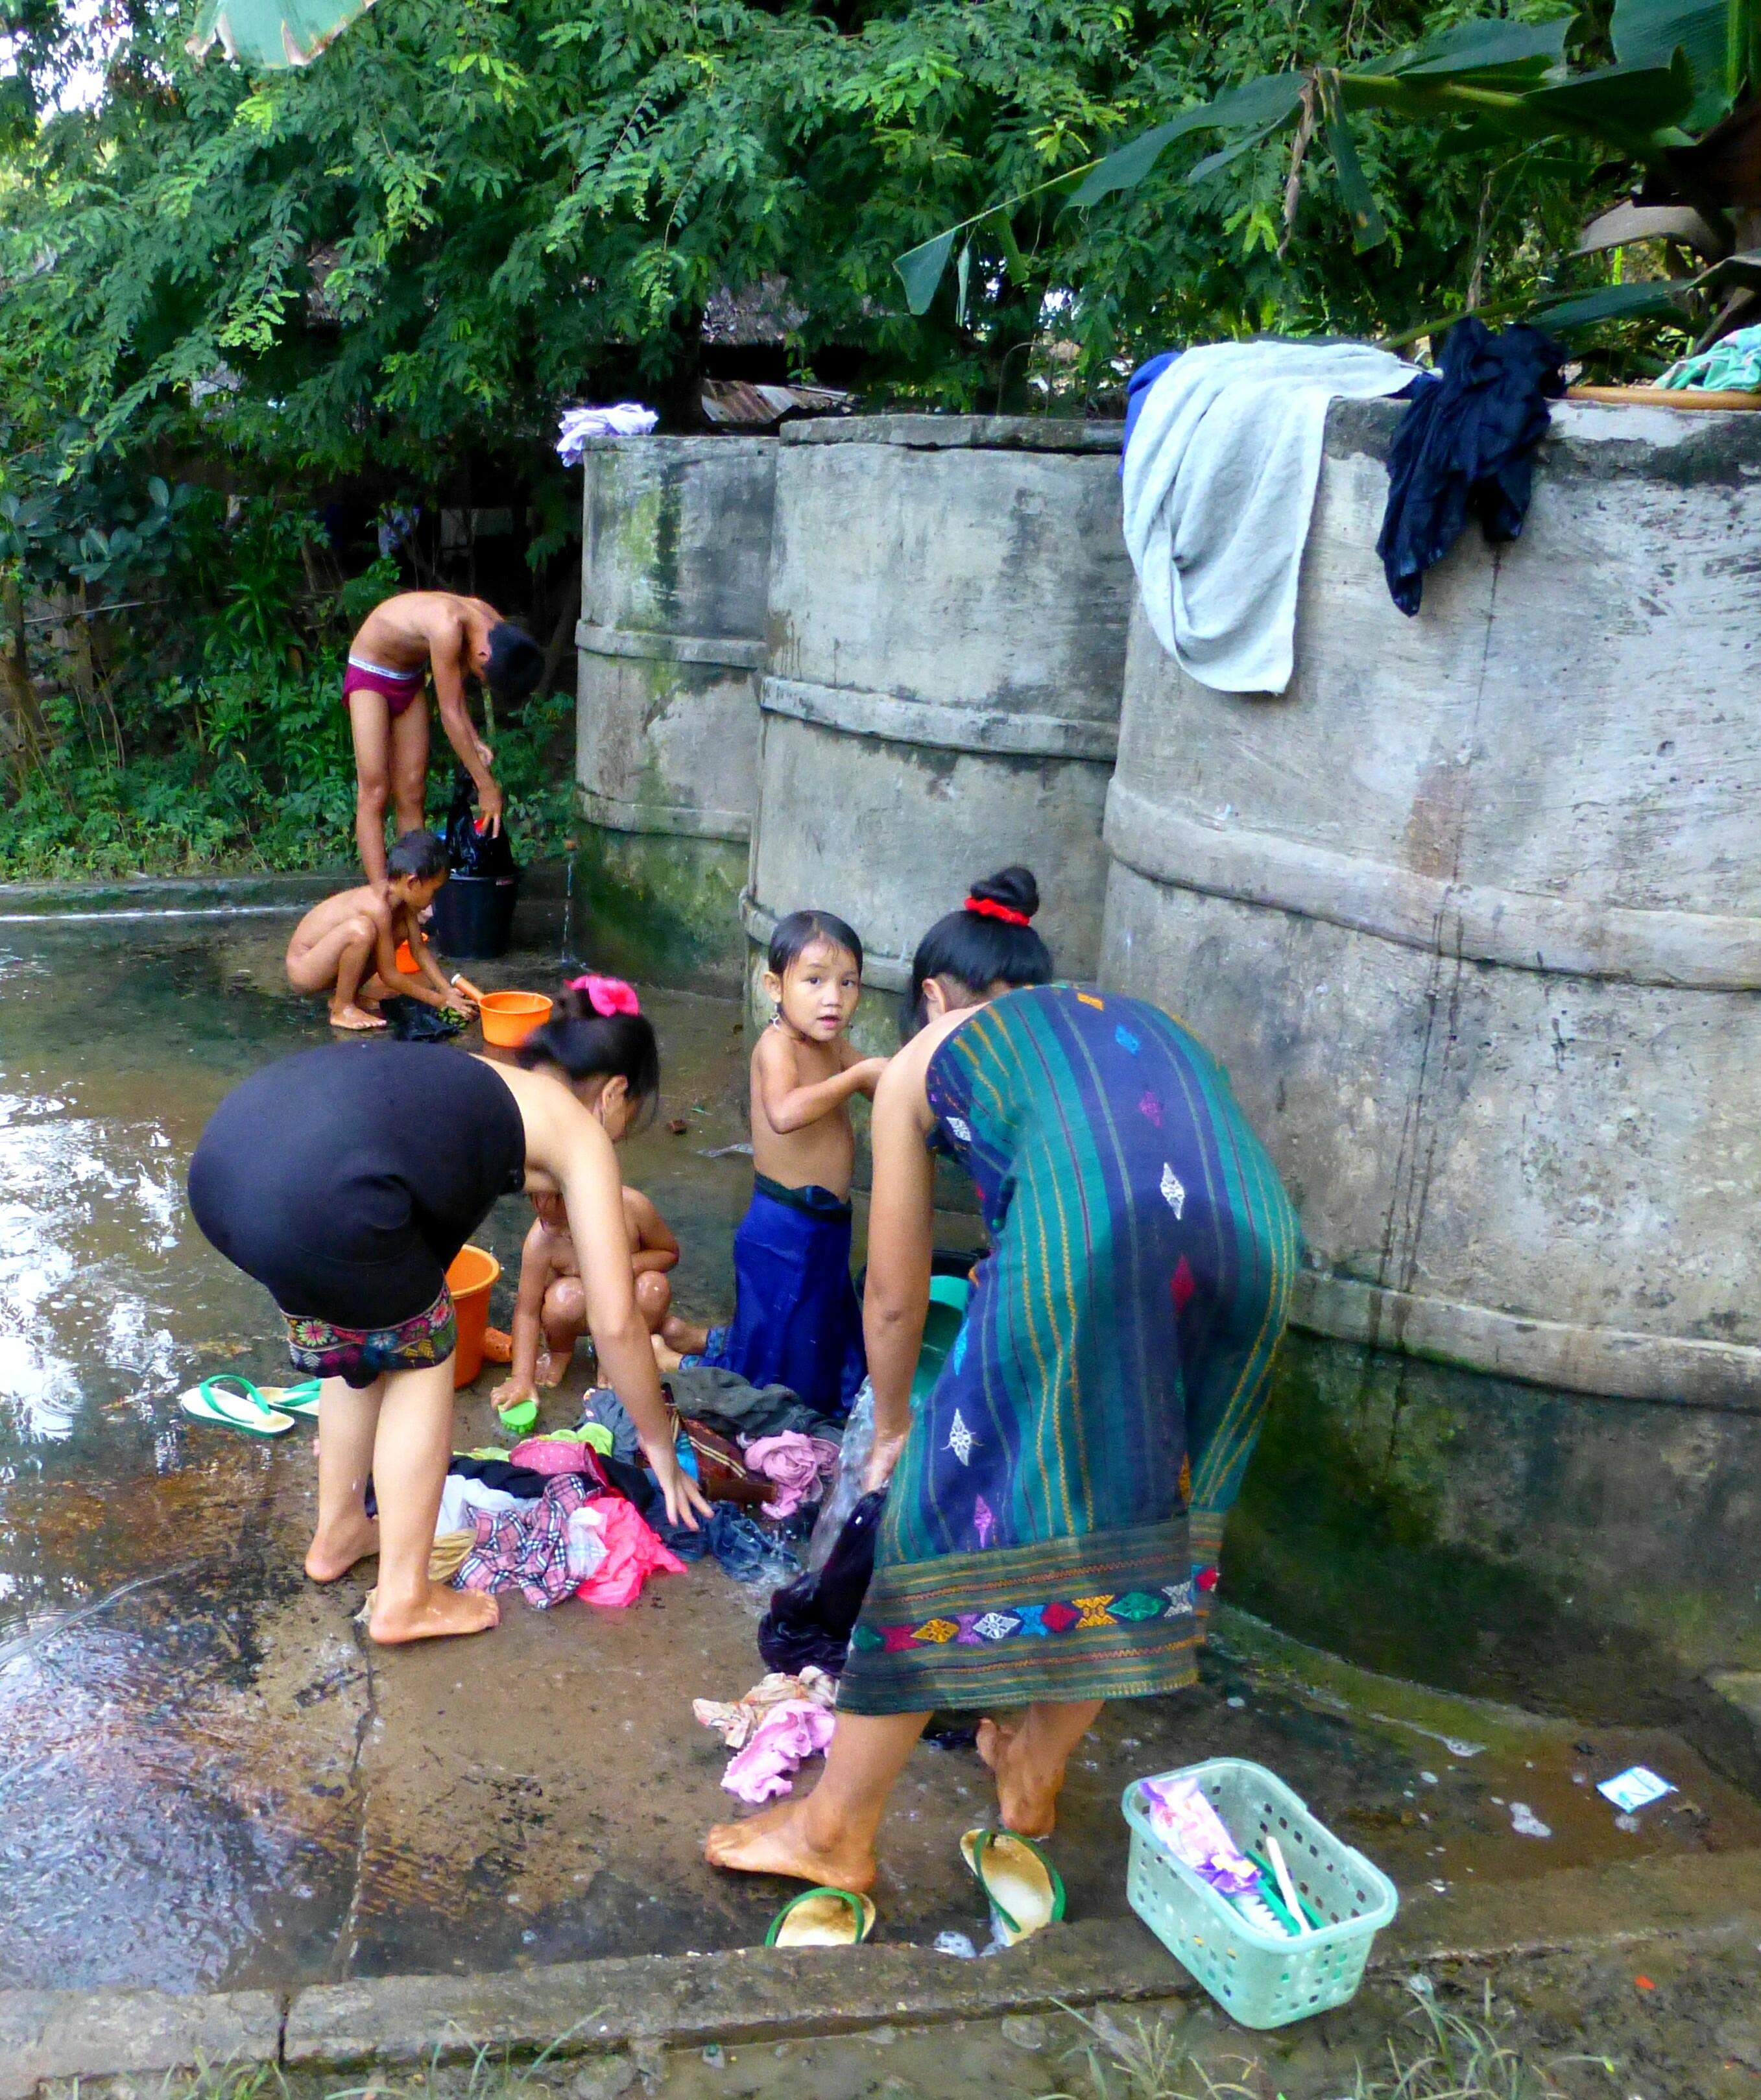 Local Village Near Luang Prabang - Safe and Healthy Travel